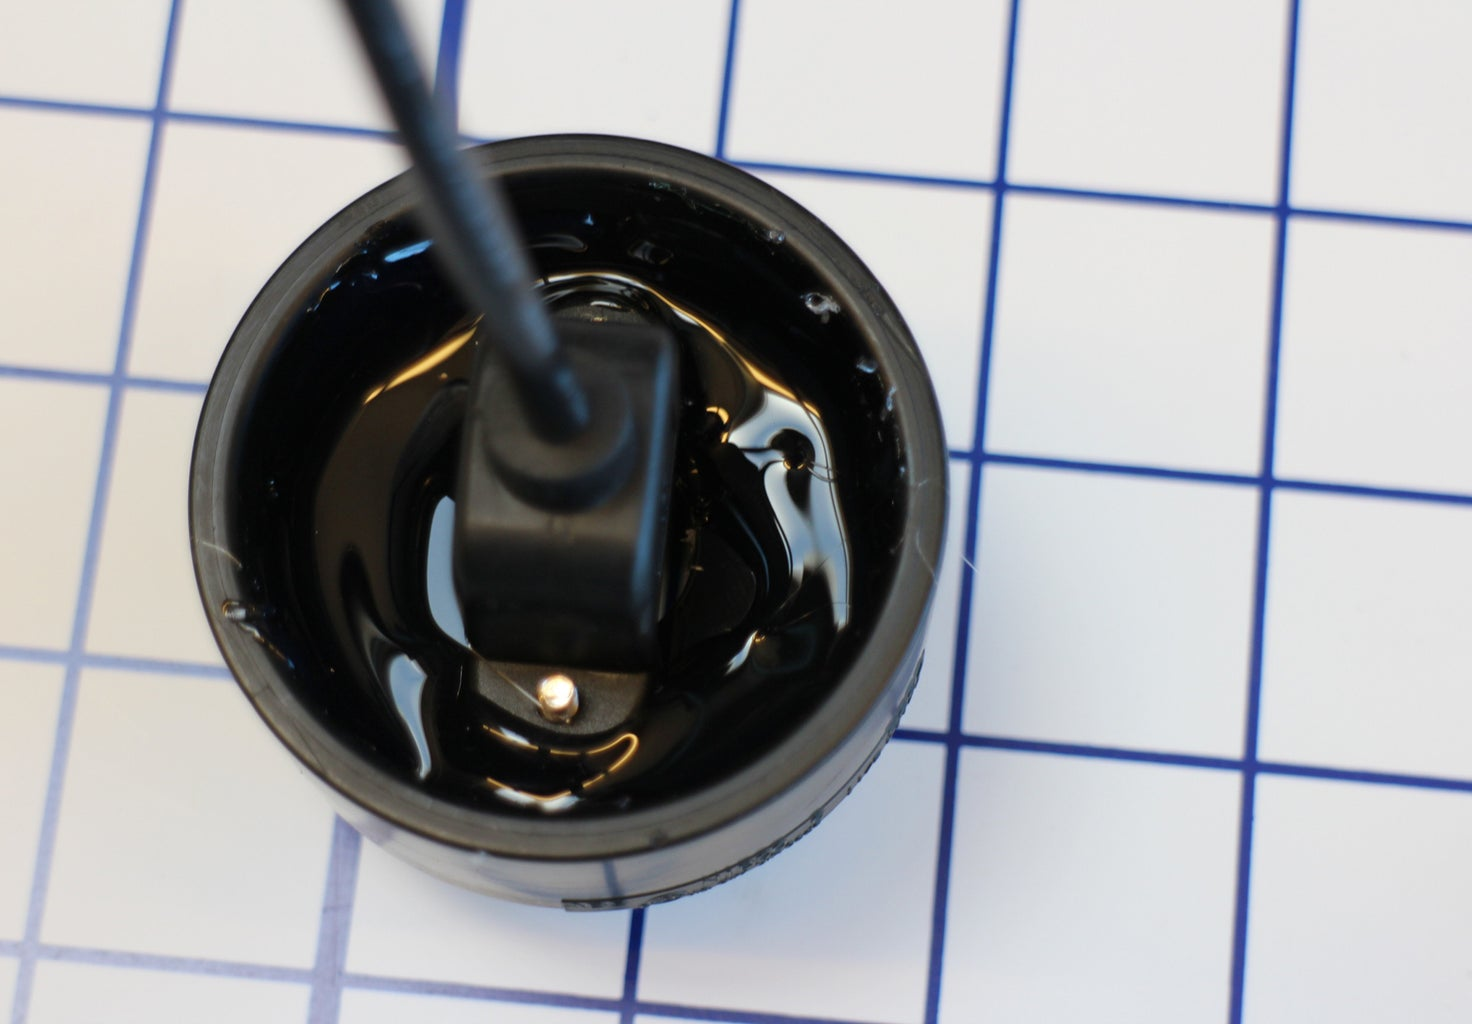 Chest Piece Electronics